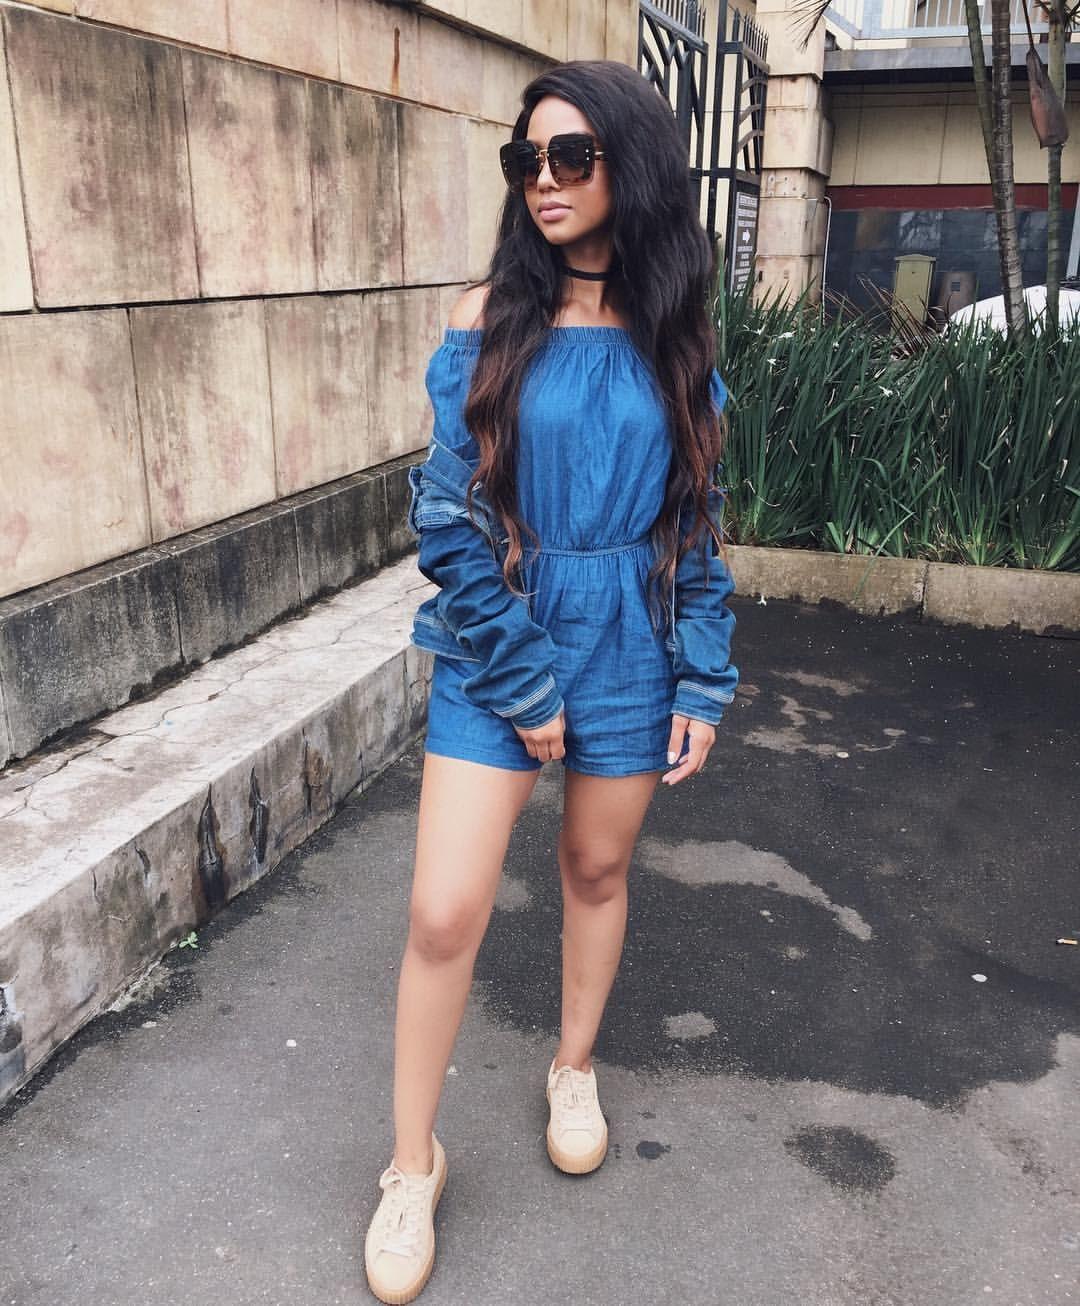 5111 Likes 25 Comments - Mihlali Ndamase (@mihlalii_n) on Instagram u201ccreeping.u201d | Fashion ...